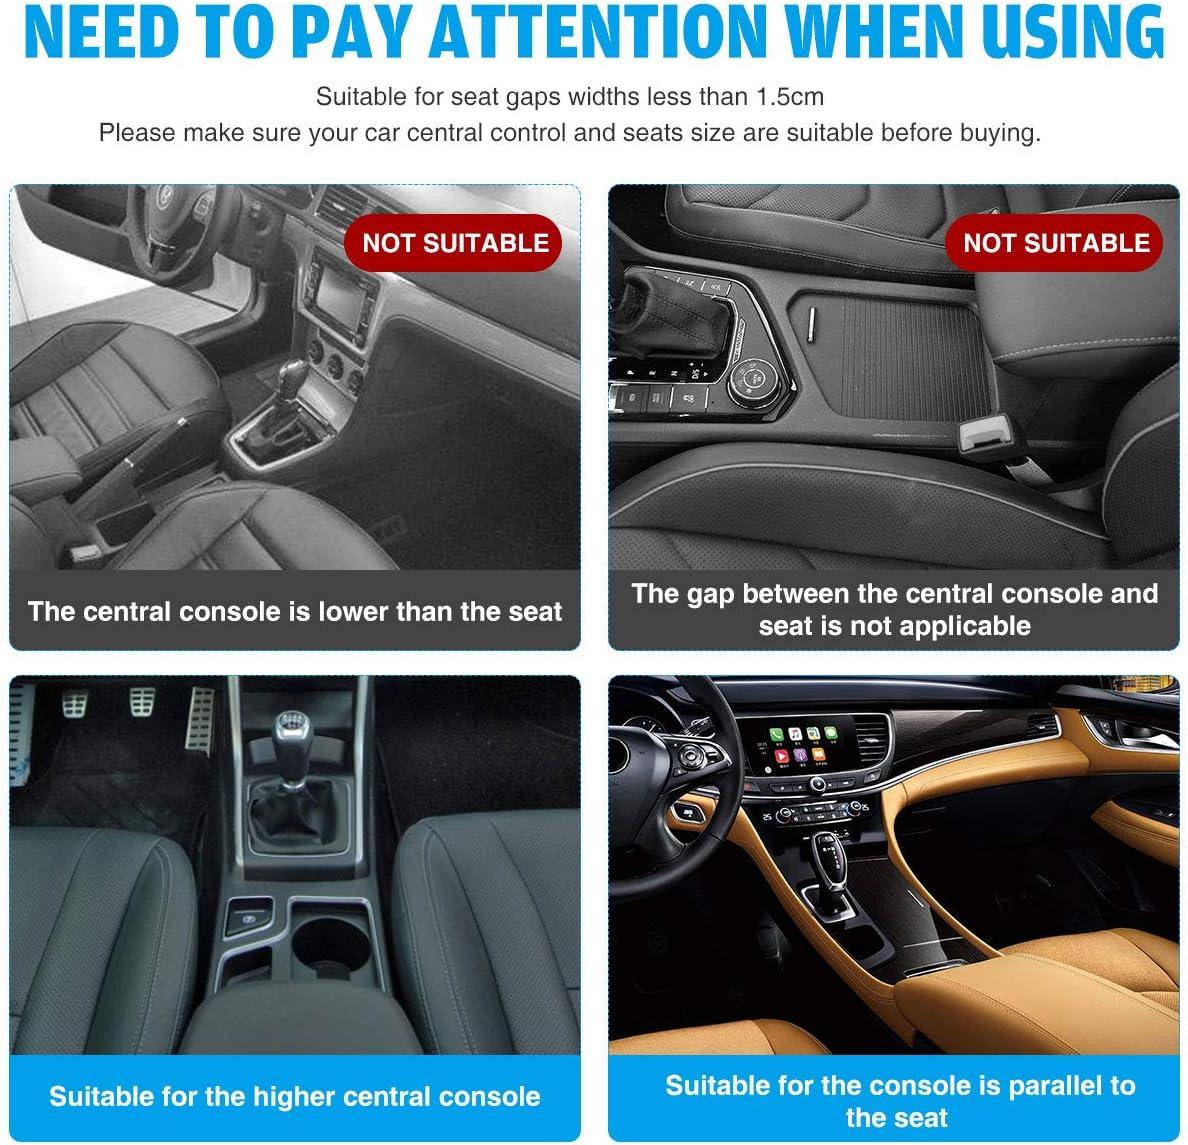 2006 Dodge Stratus Sedan Pink Driver 2001 2005 2002 GGBAILEY D4761A-S2A-PNK Custom Fit Car Mats for 2000 Passenger /& Rear Floor 2004 2003